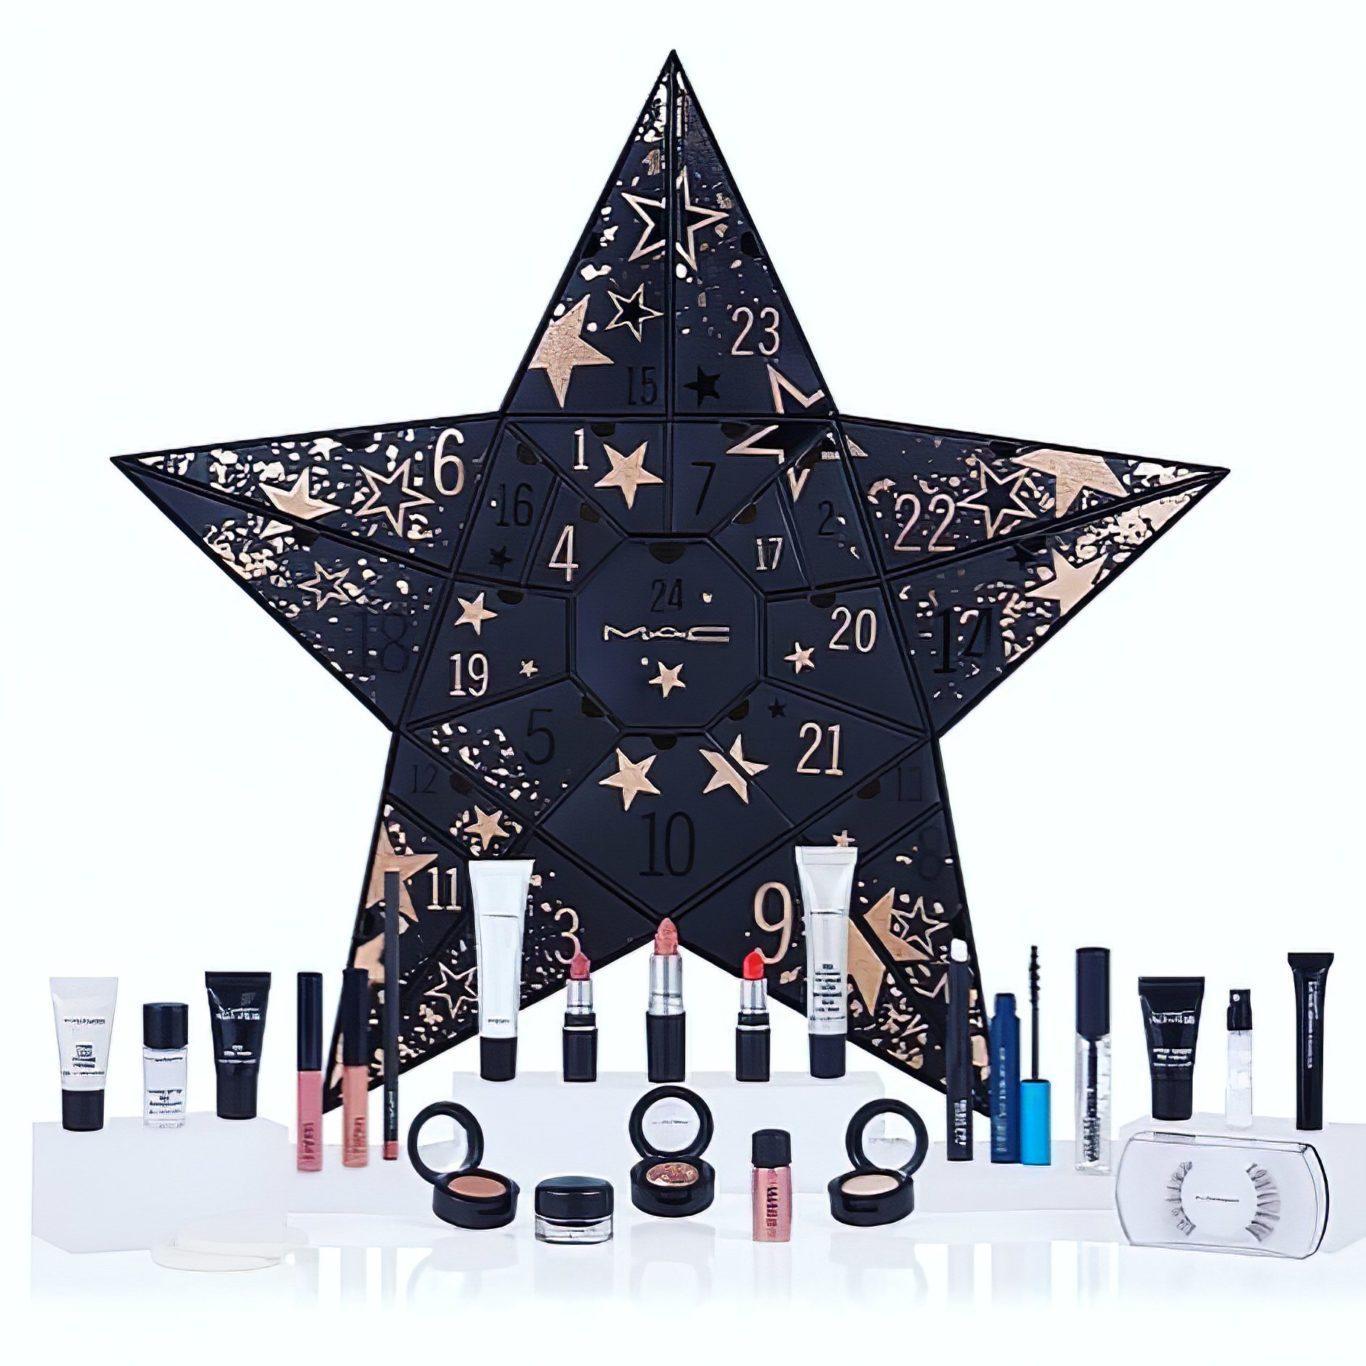 cosmetics advent calendar